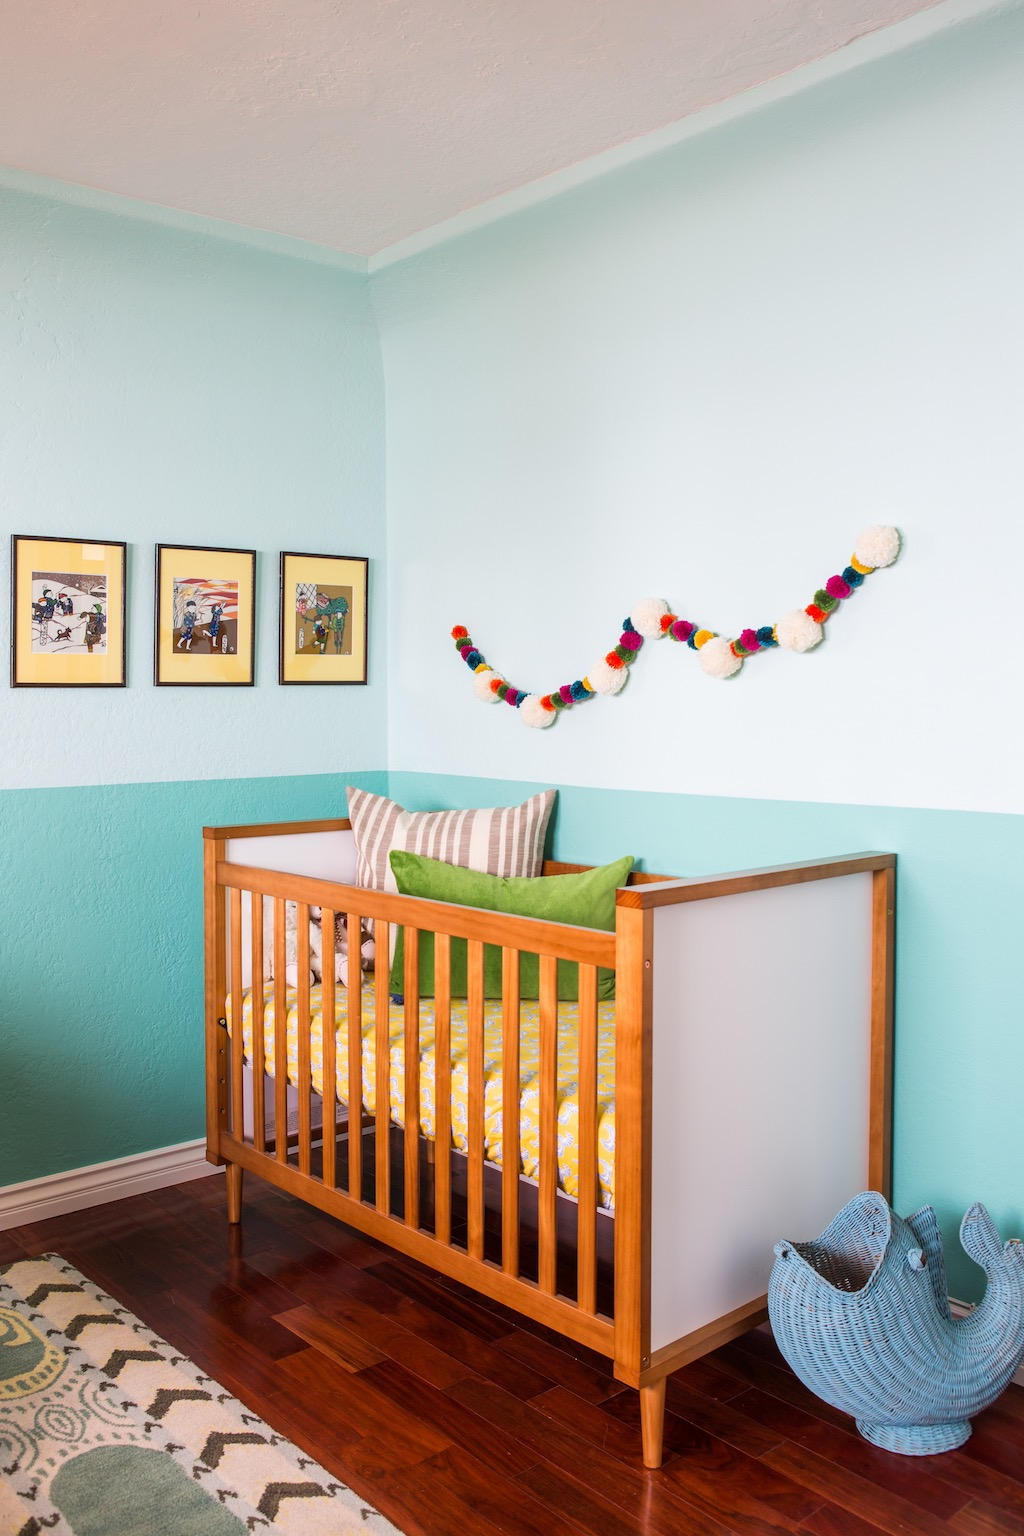 30 Small Modern Bathroom Ideas: 33 Baby Room Interior Decor And Design Ideas #18083